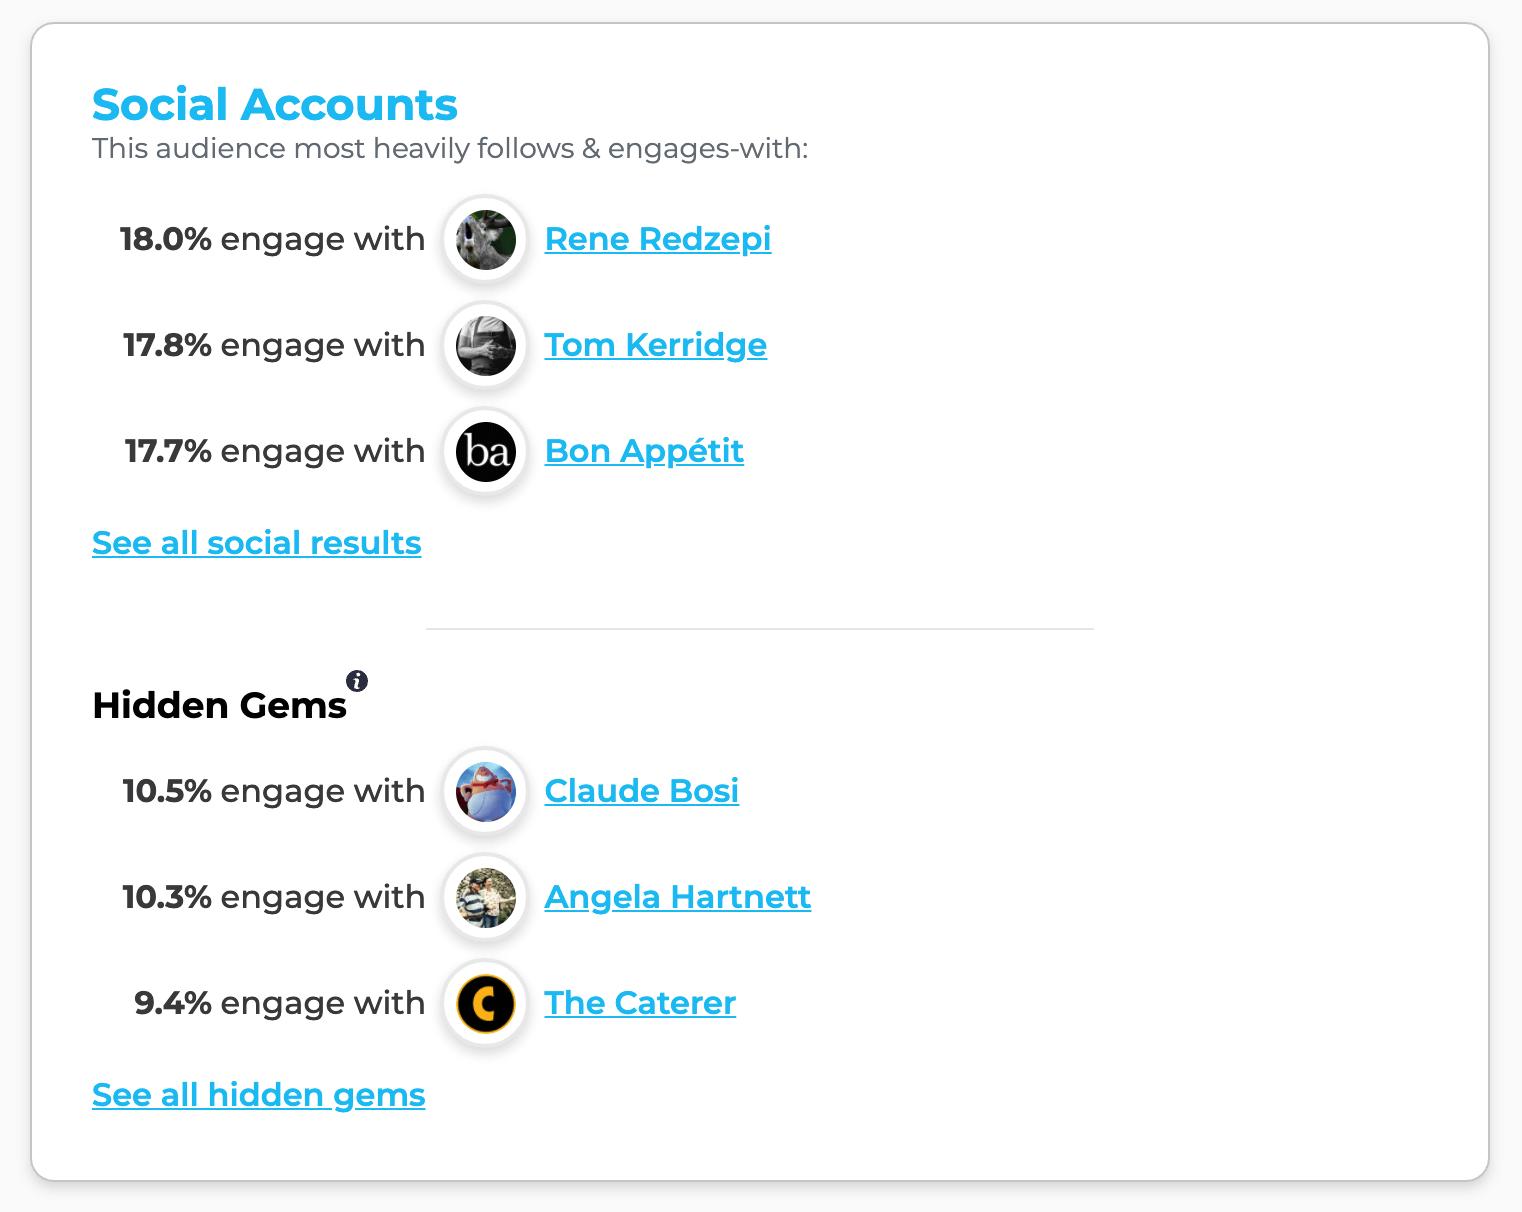 "Social Accounts: This audience most heavily follows & engages-with Rene Redzepi, Tom Kerridge, Bon Appetit; Hidden Gems: Claude Bosi, Angela Hartnett, The Caterer"""